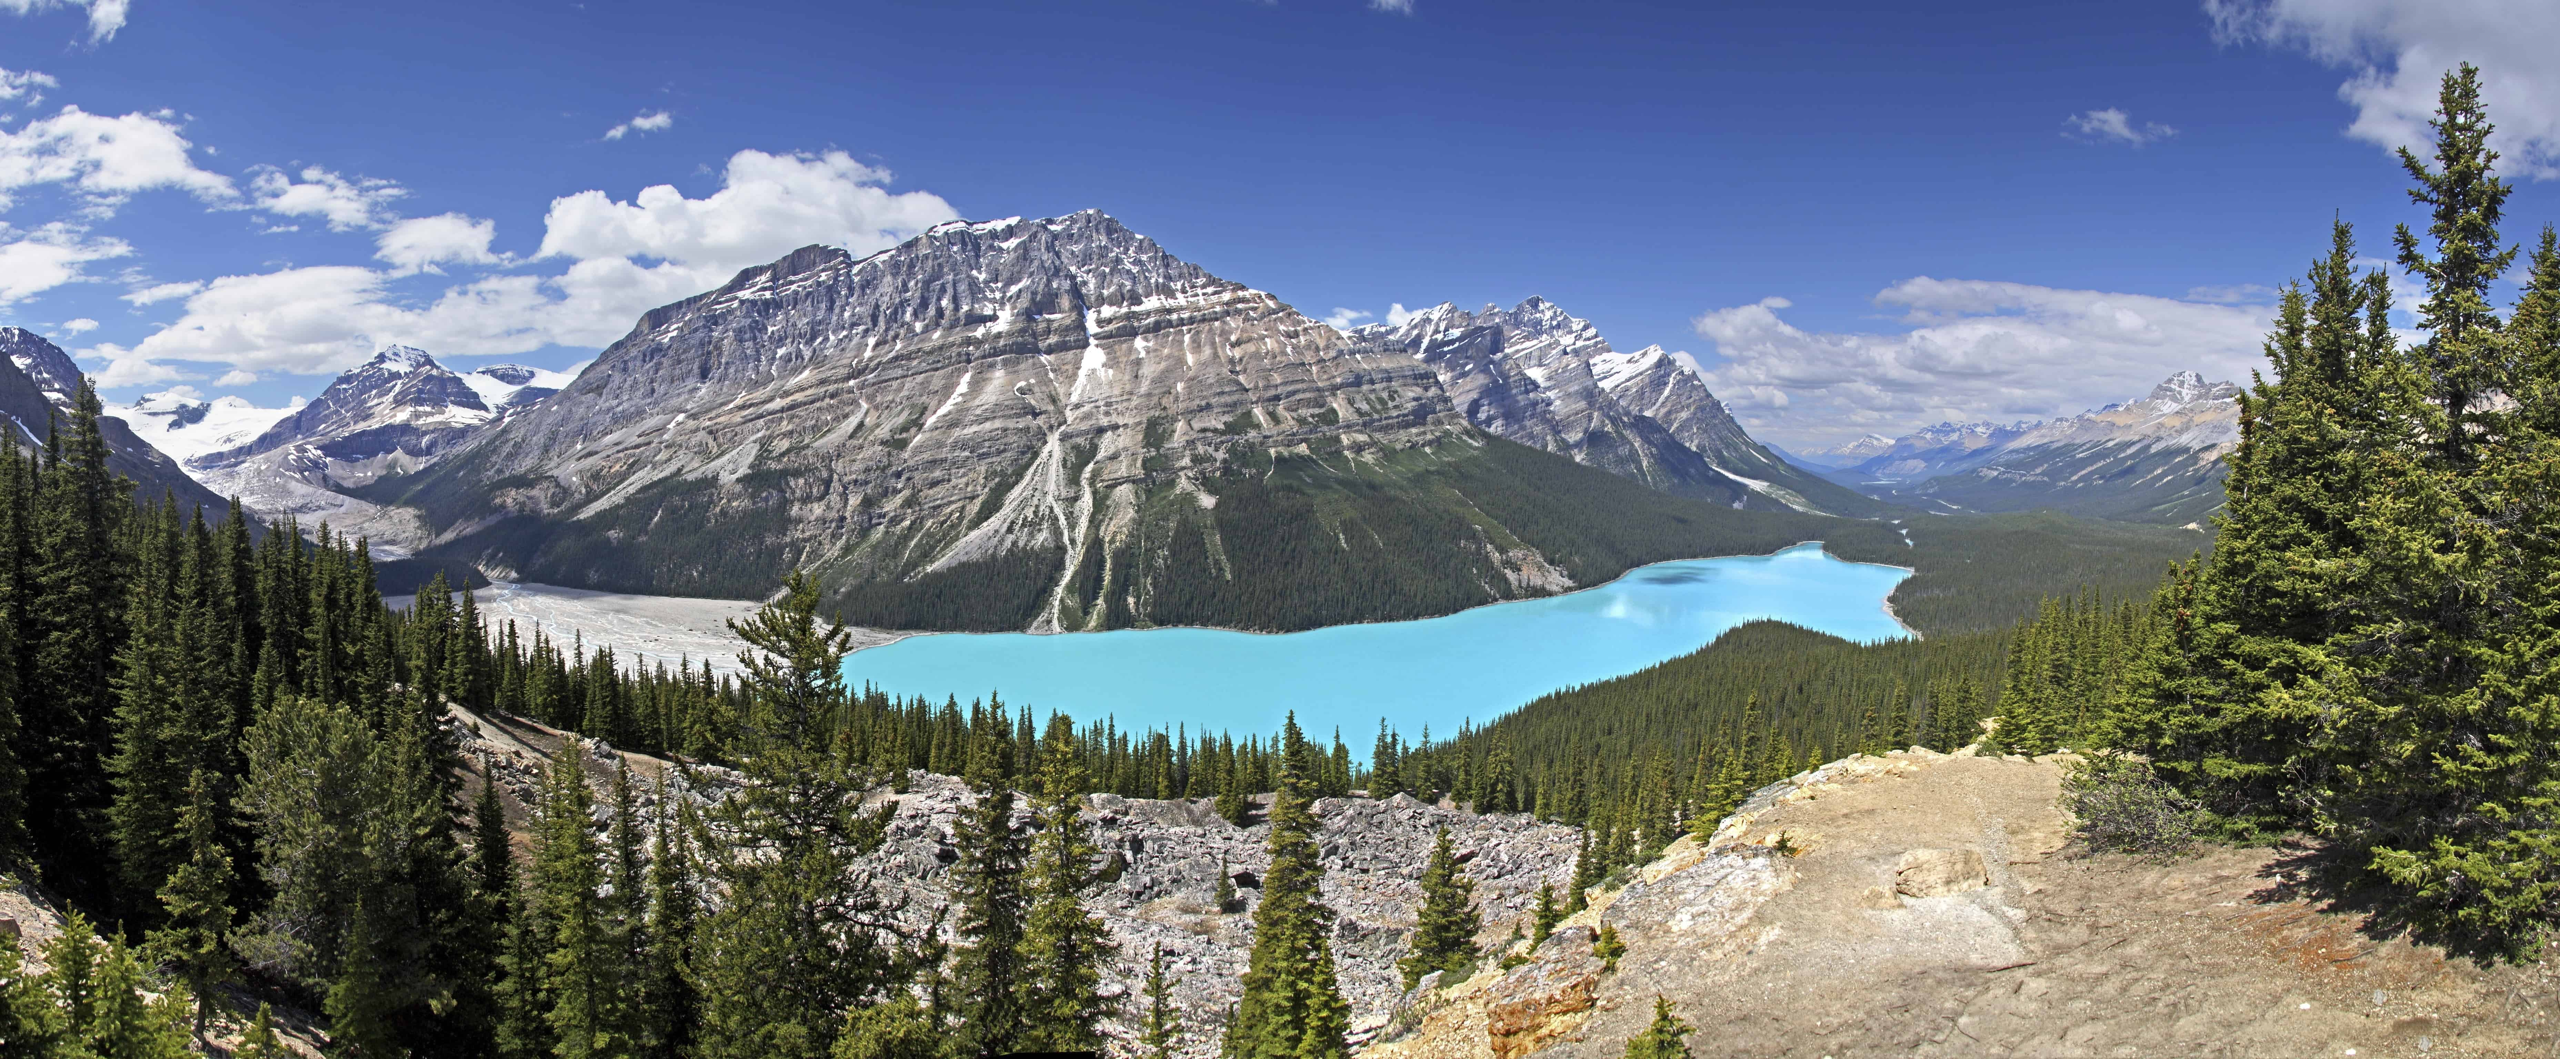 Peyto Lake i Alberta